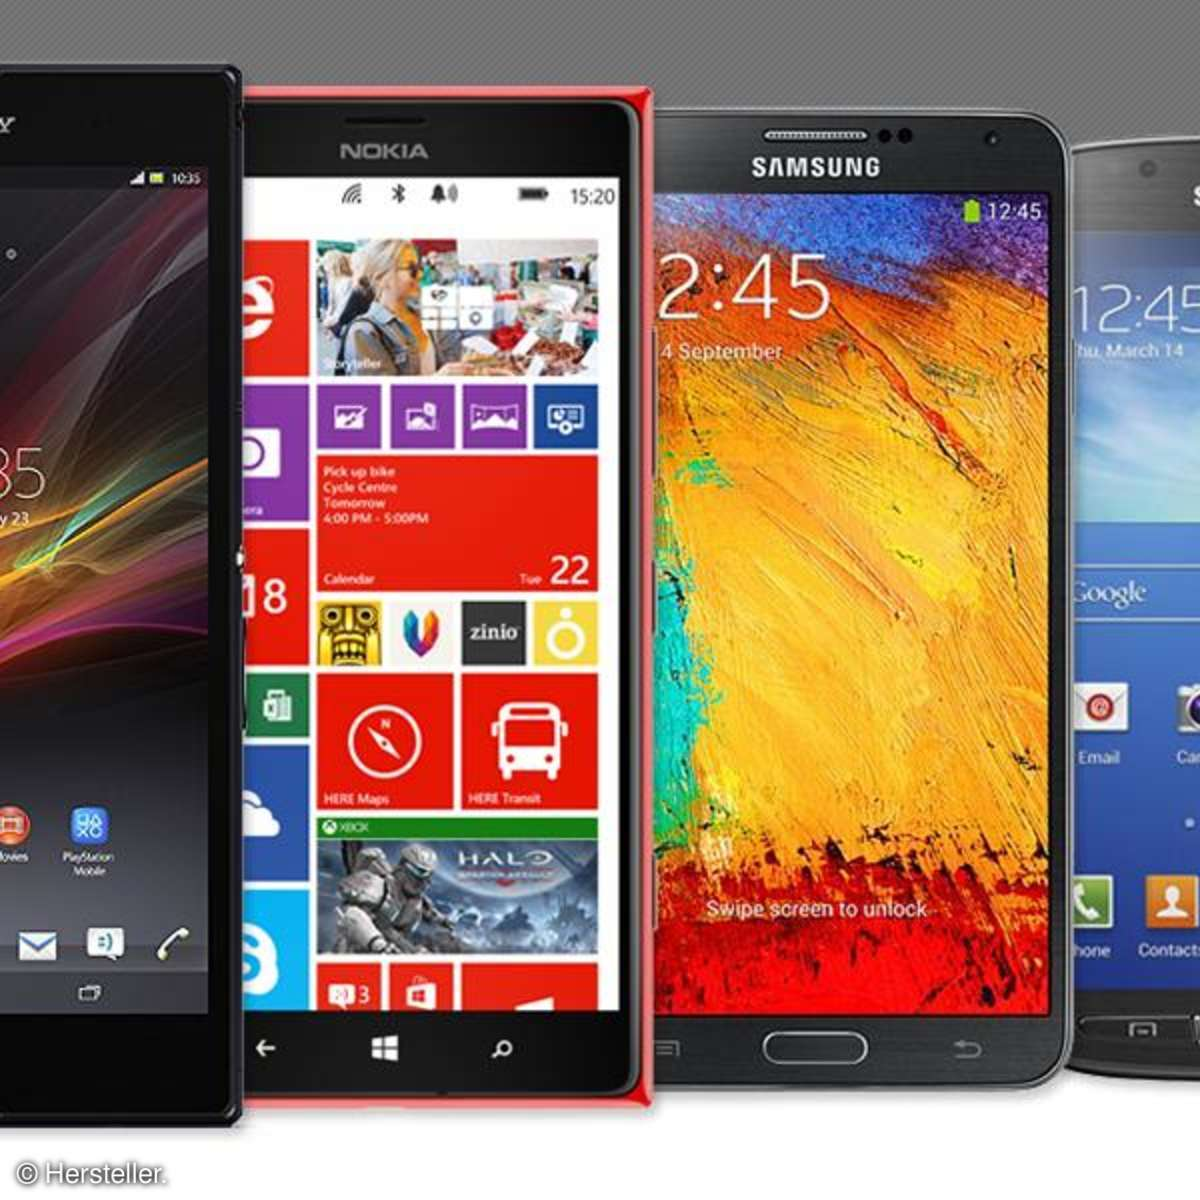 Sony Xperia Ultra Z, Nokia Lumia 1520, Samsung Galaxy Note 3, Samsung Galaxy S4 Active